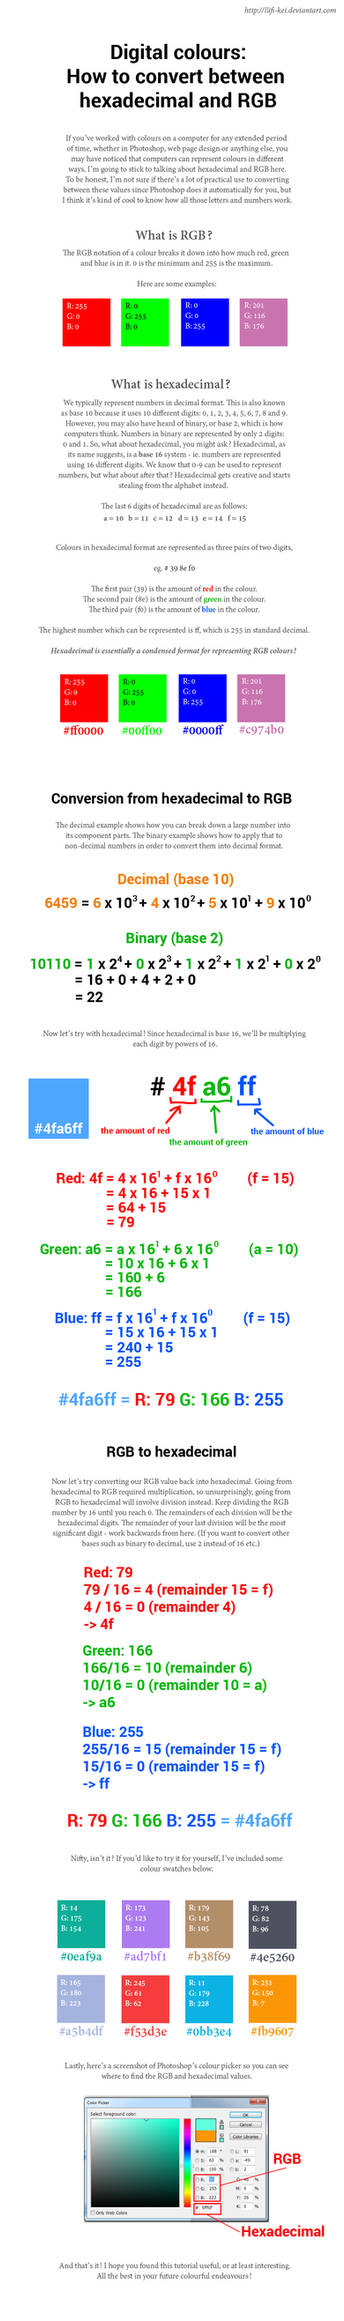 How to convert between hexadecimal and RGB